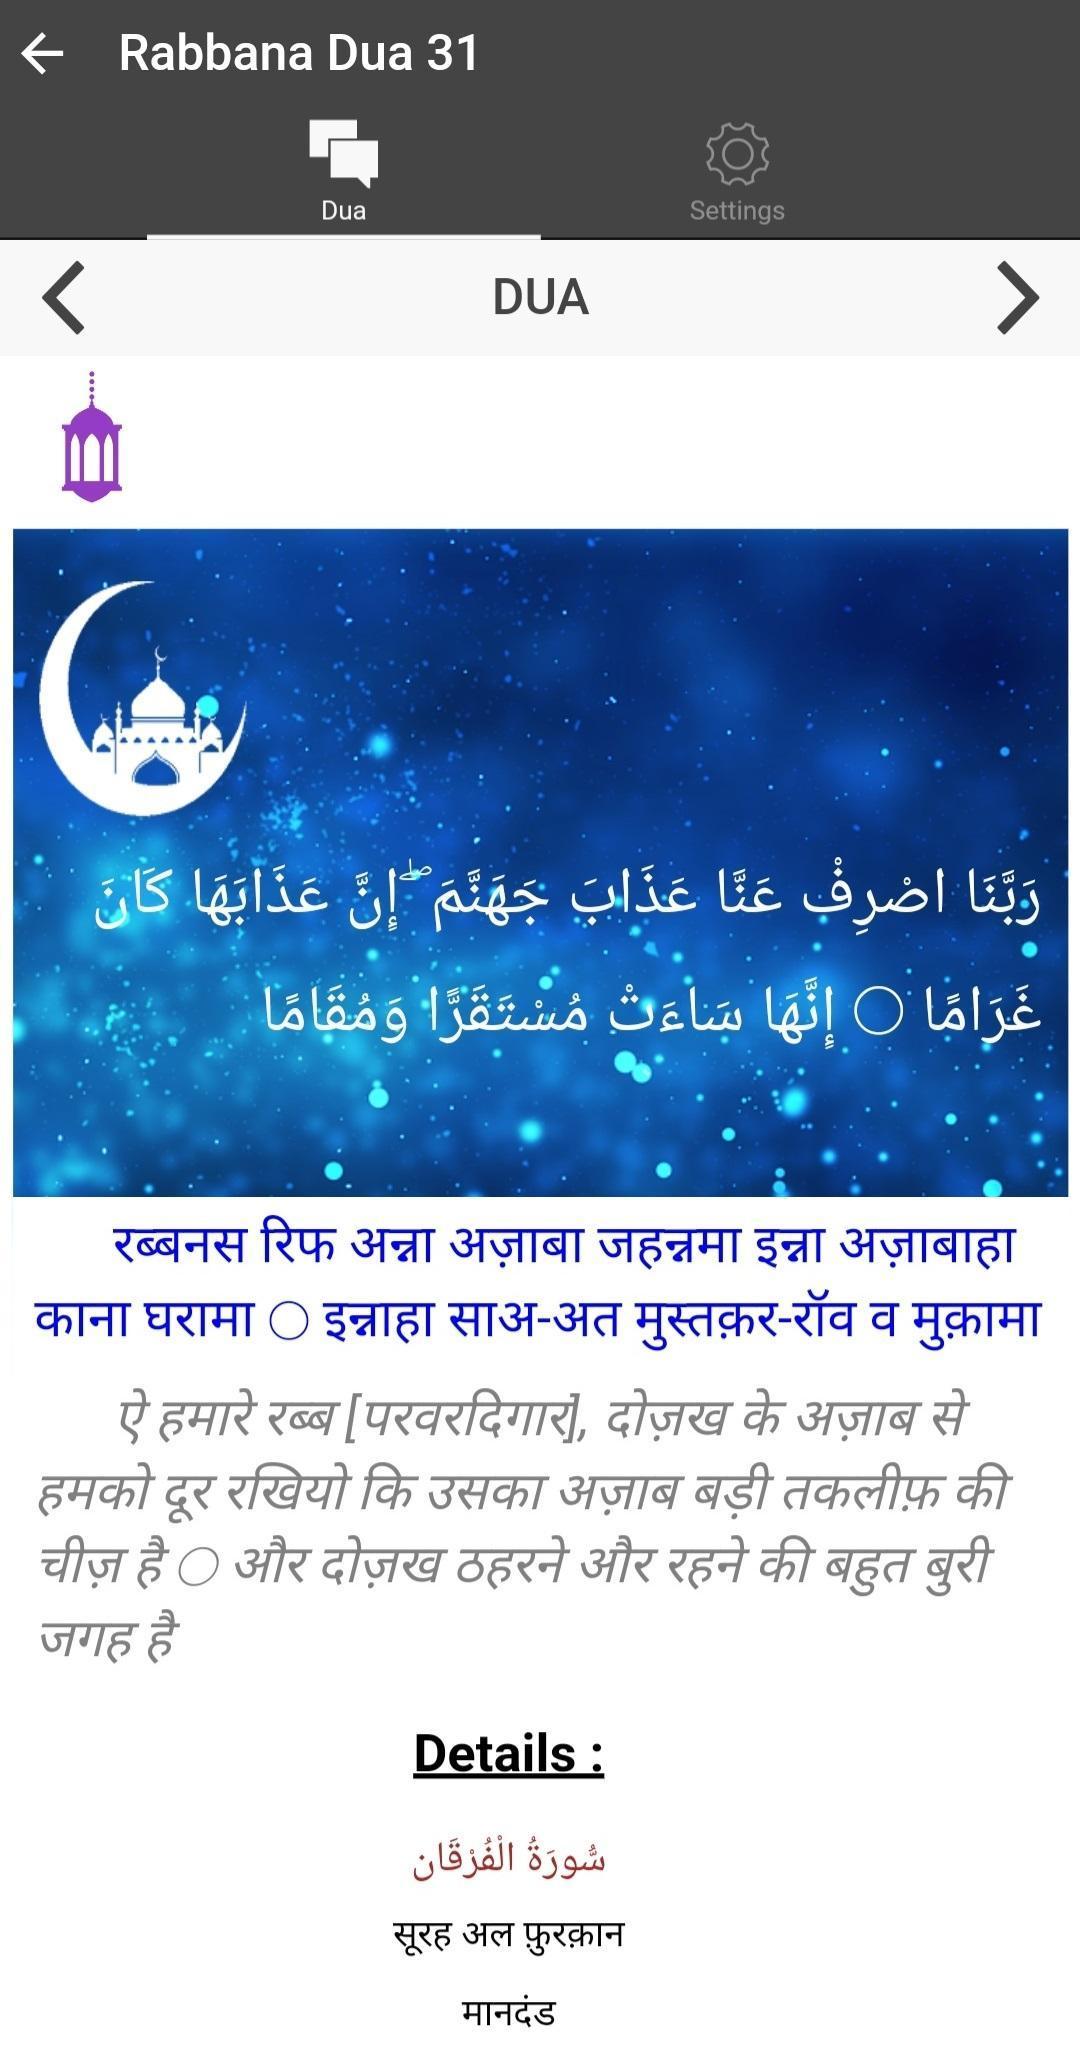 40 Rabbana Dua Arabic English Hindi for Android - APK Download